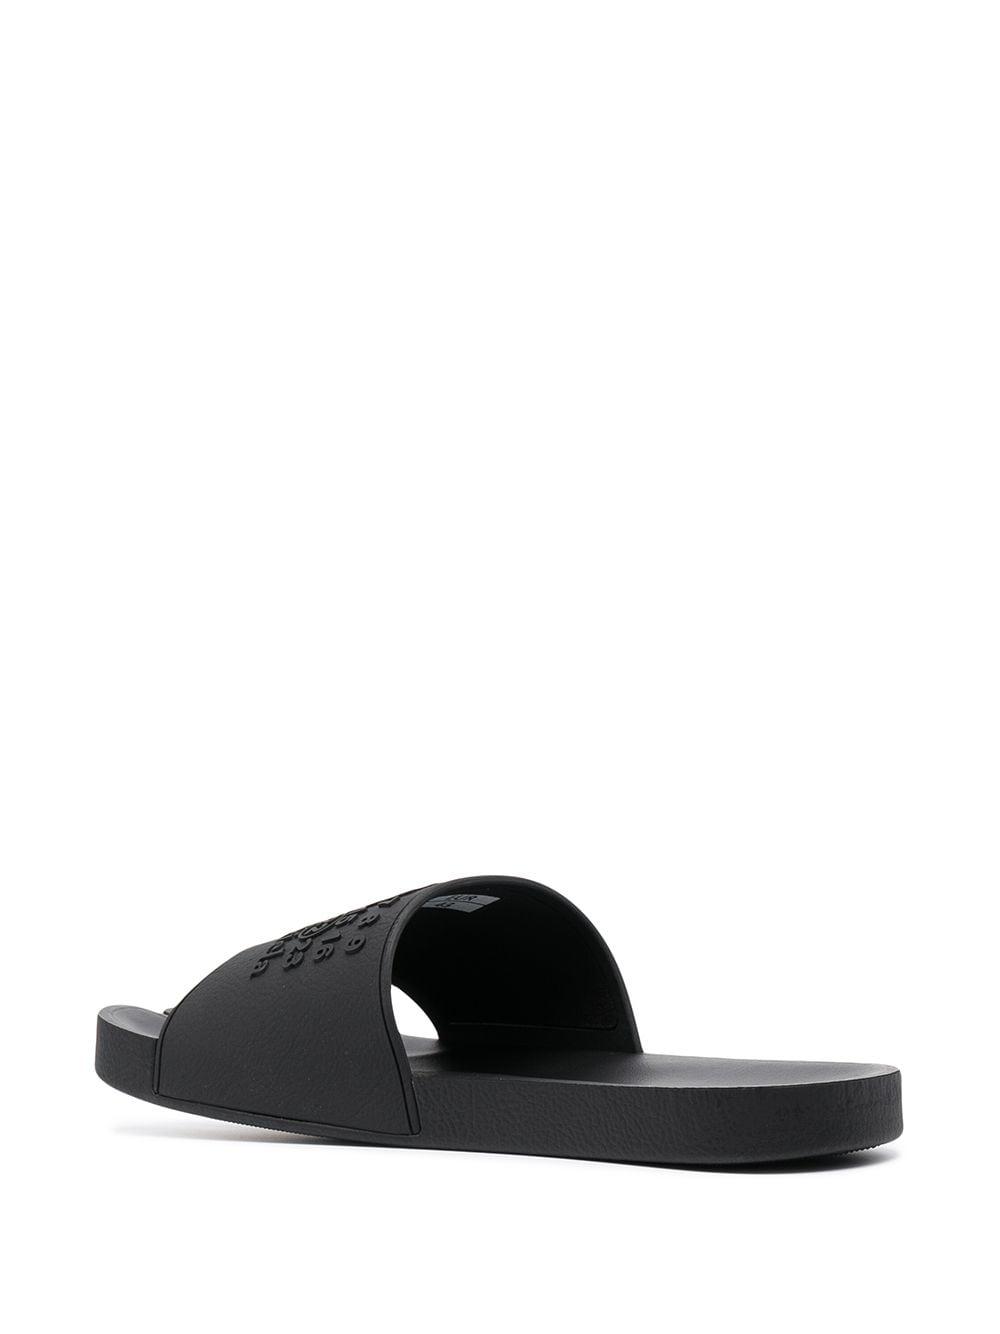 SLIDE TABI SANDAL MAISON MARGIELA | Sandals | S57WX0075 P4027T8008